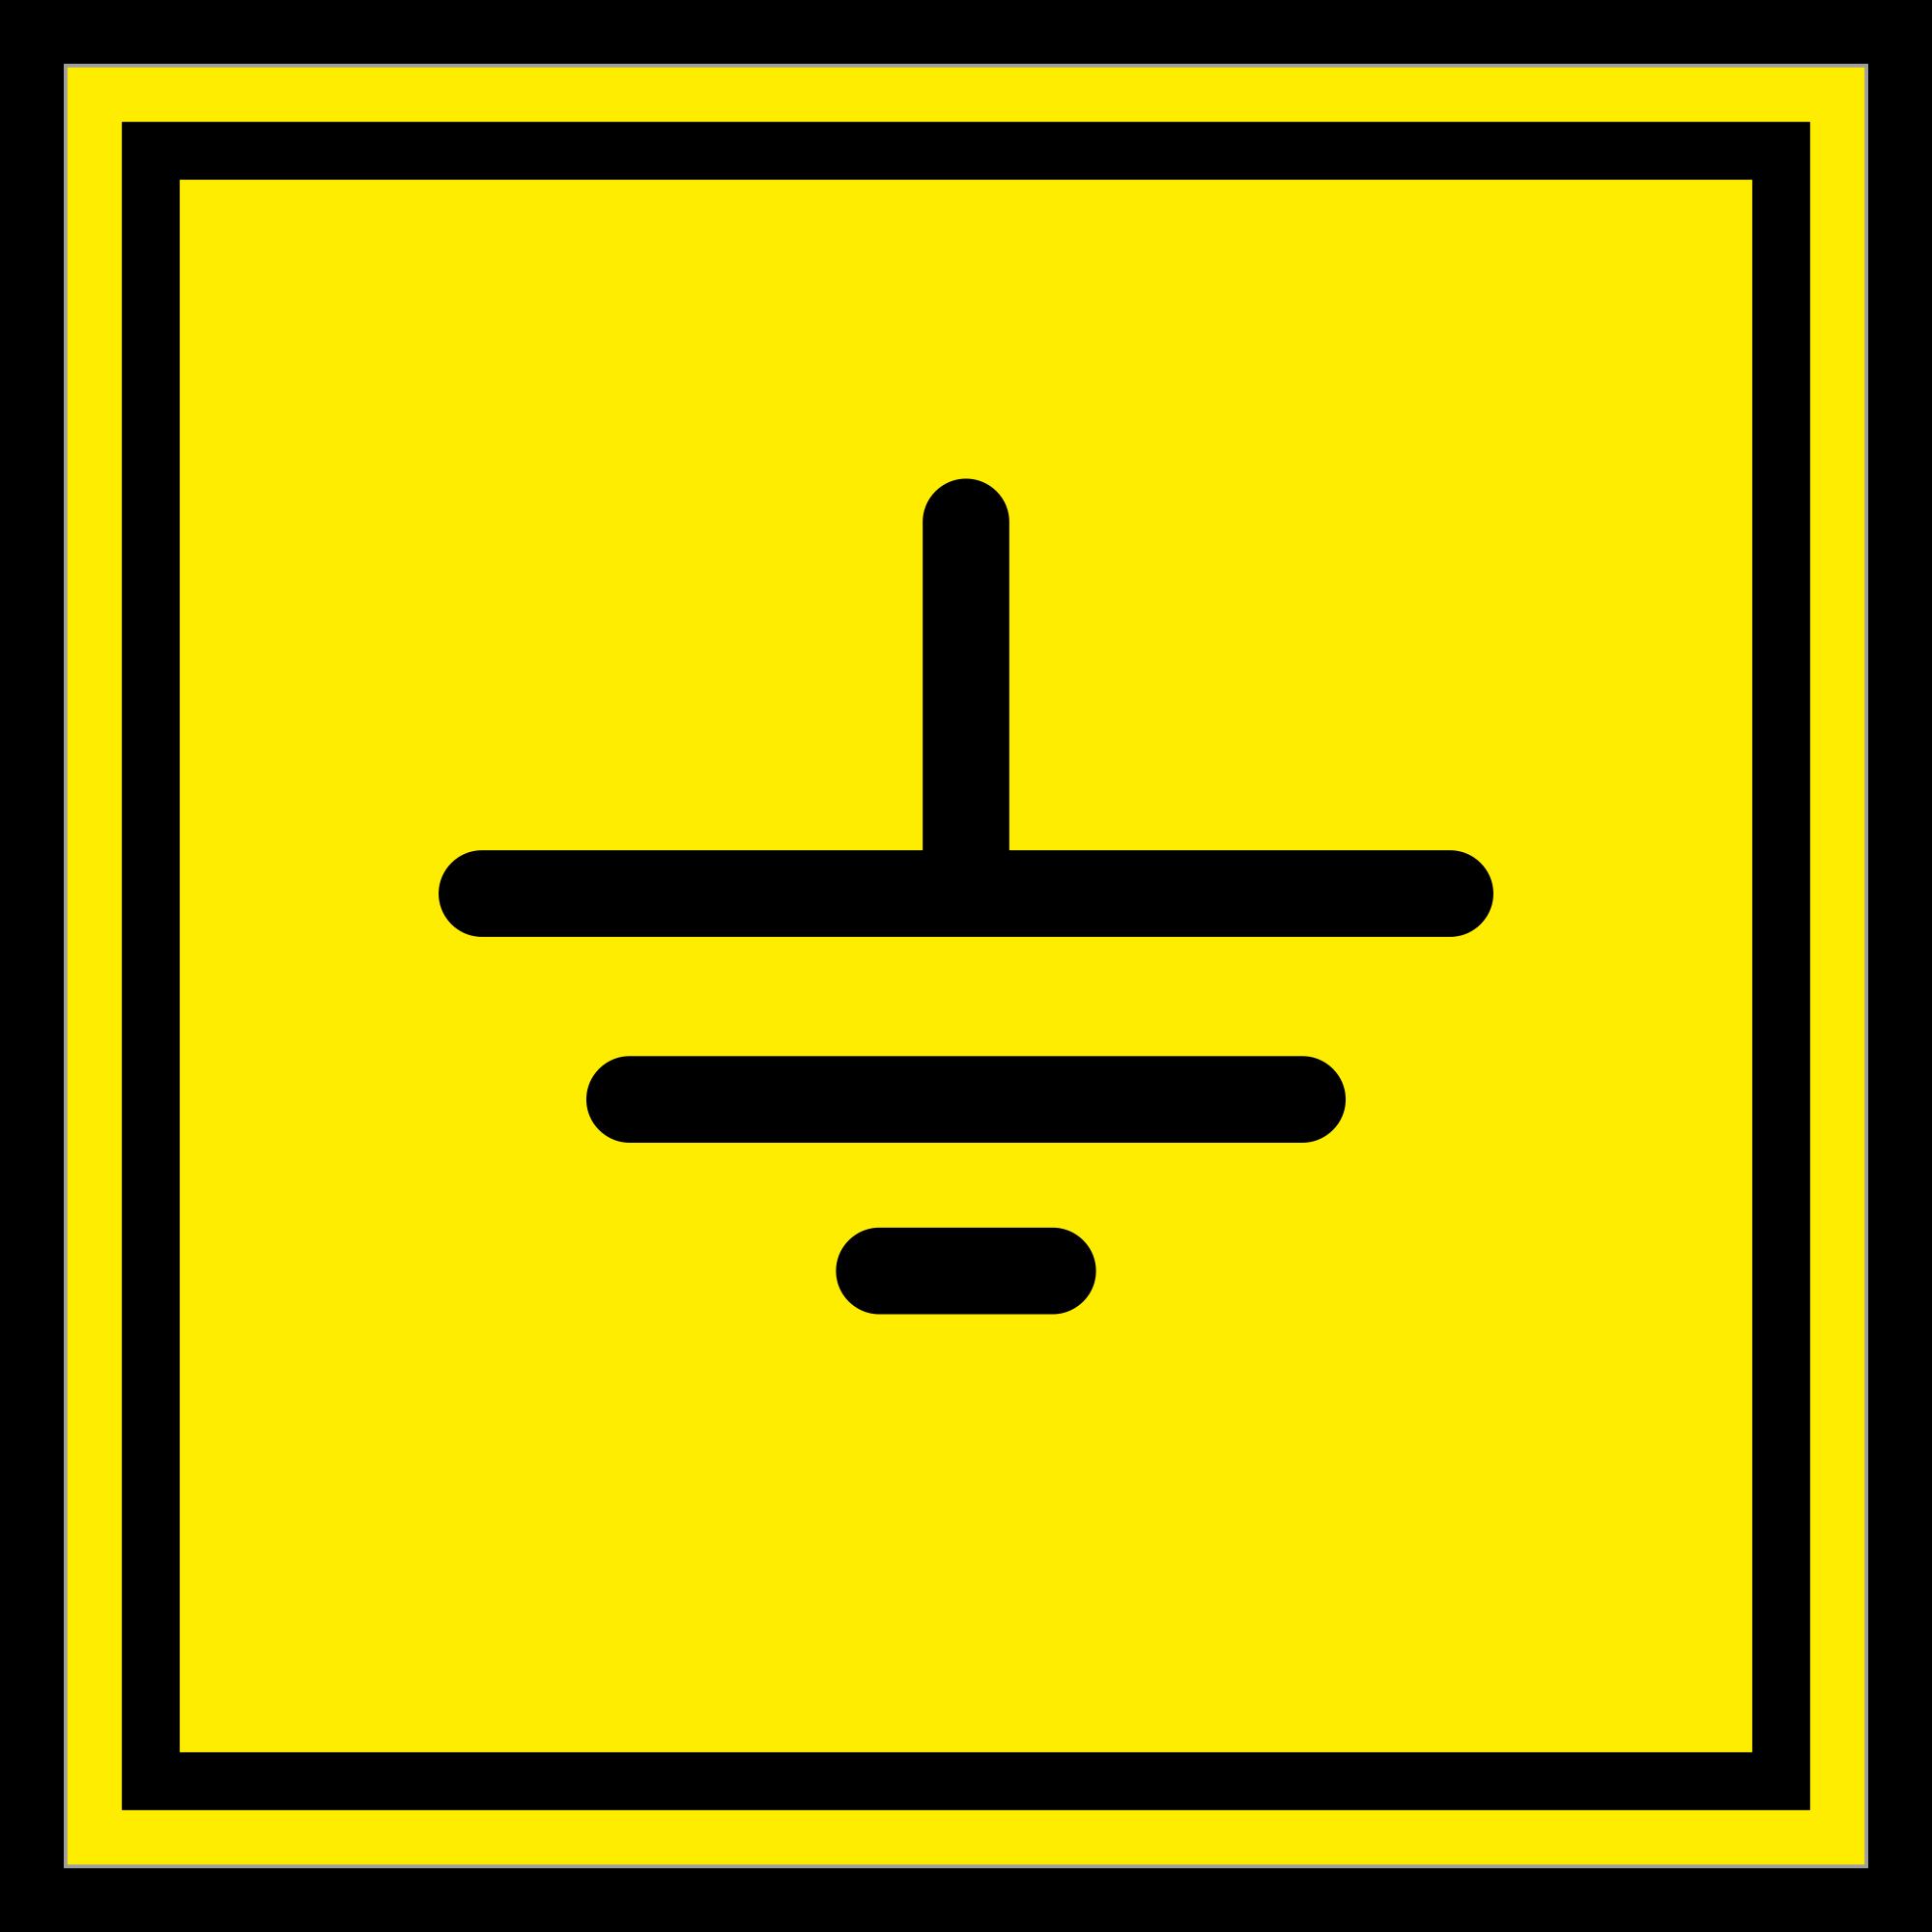 ЭБ-04 Знак заземления по ГОСТ